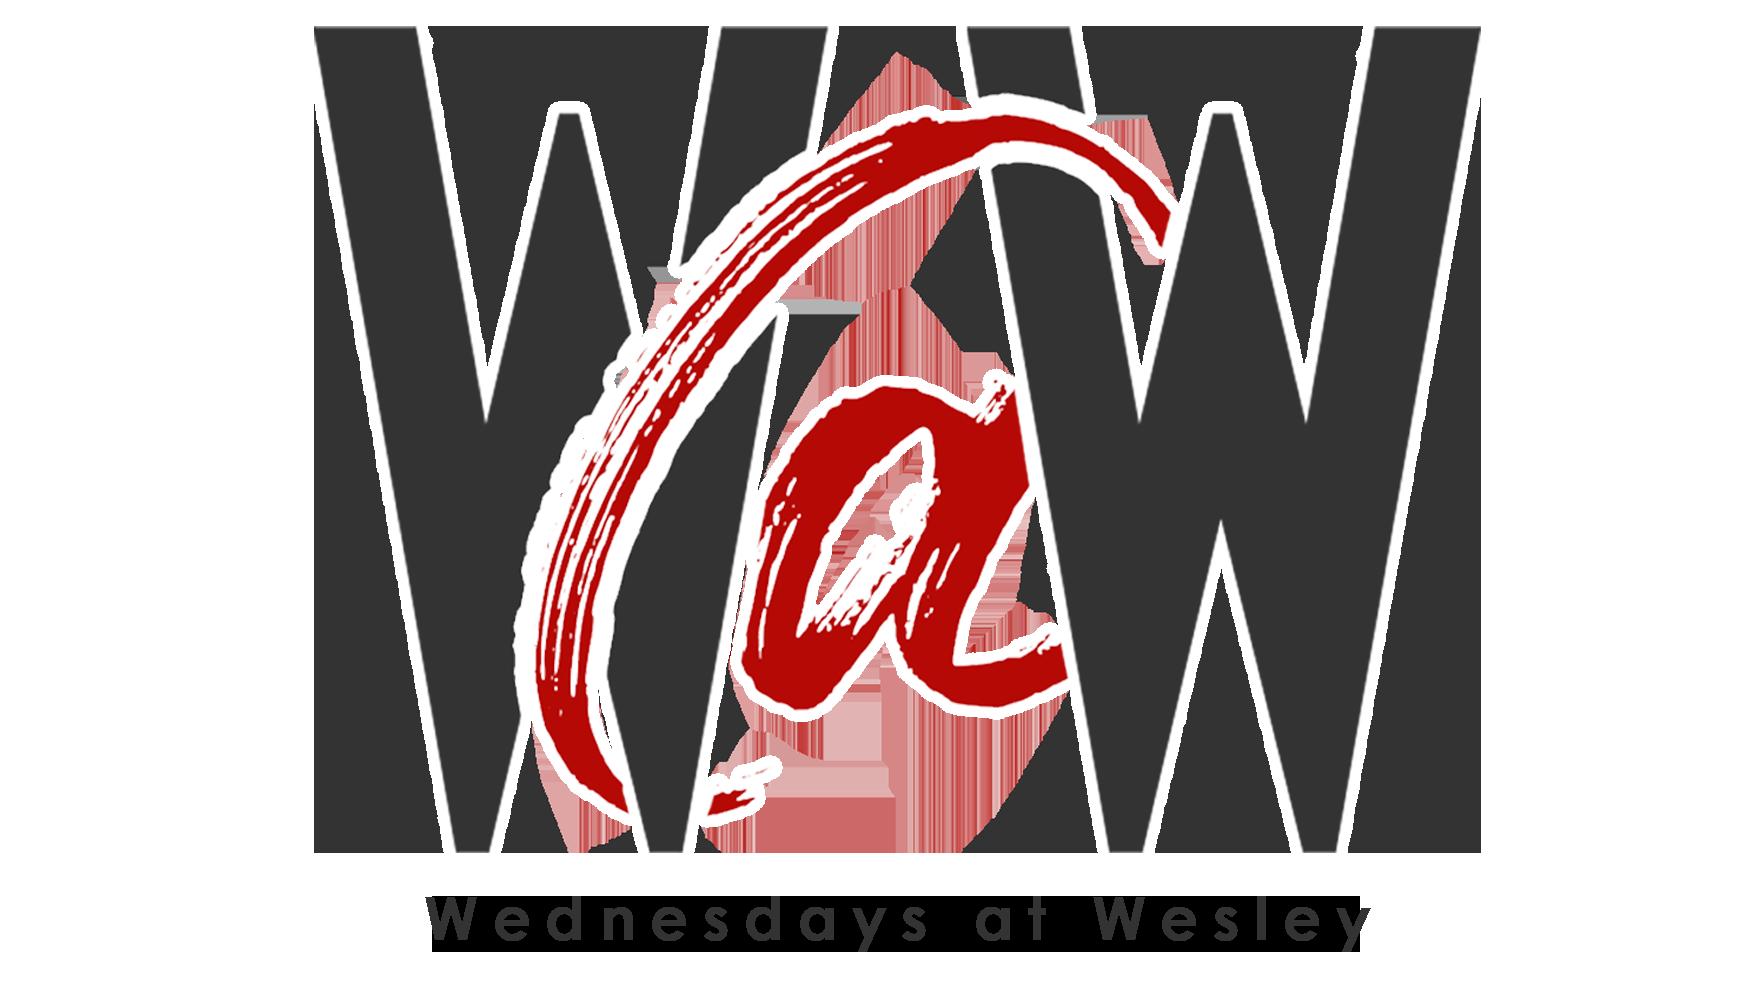 wednesdays at wesley umc